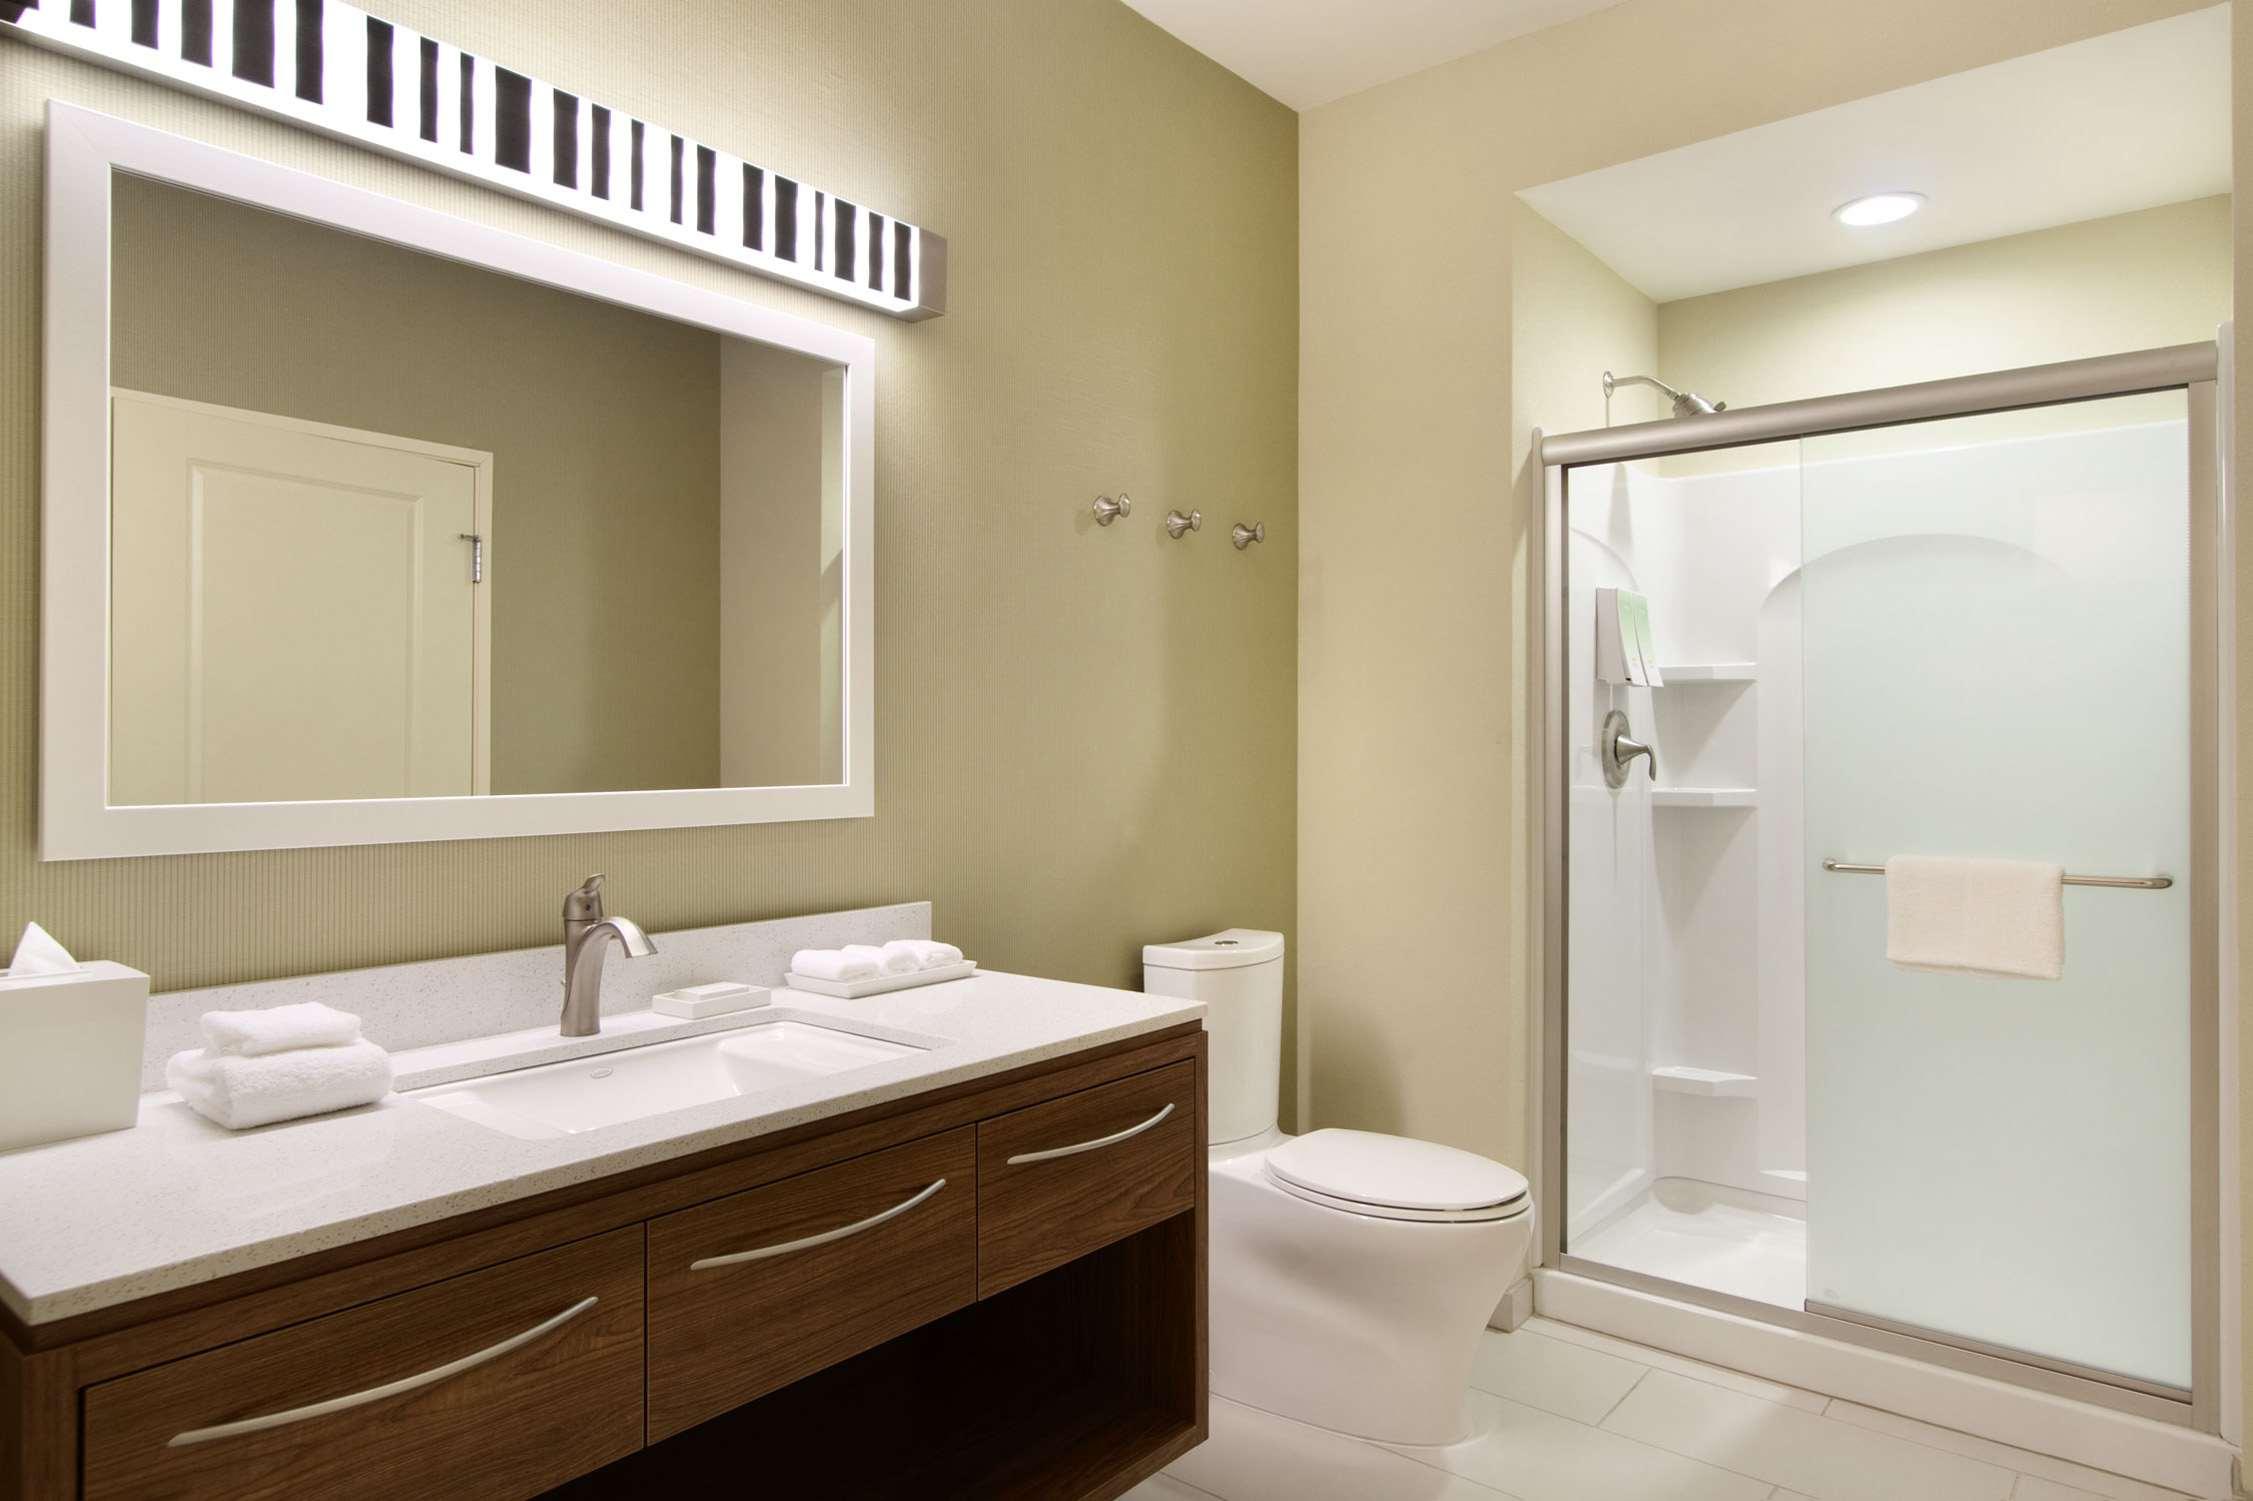 Home2 Suites by Hilton Fayetteville, NC image 6